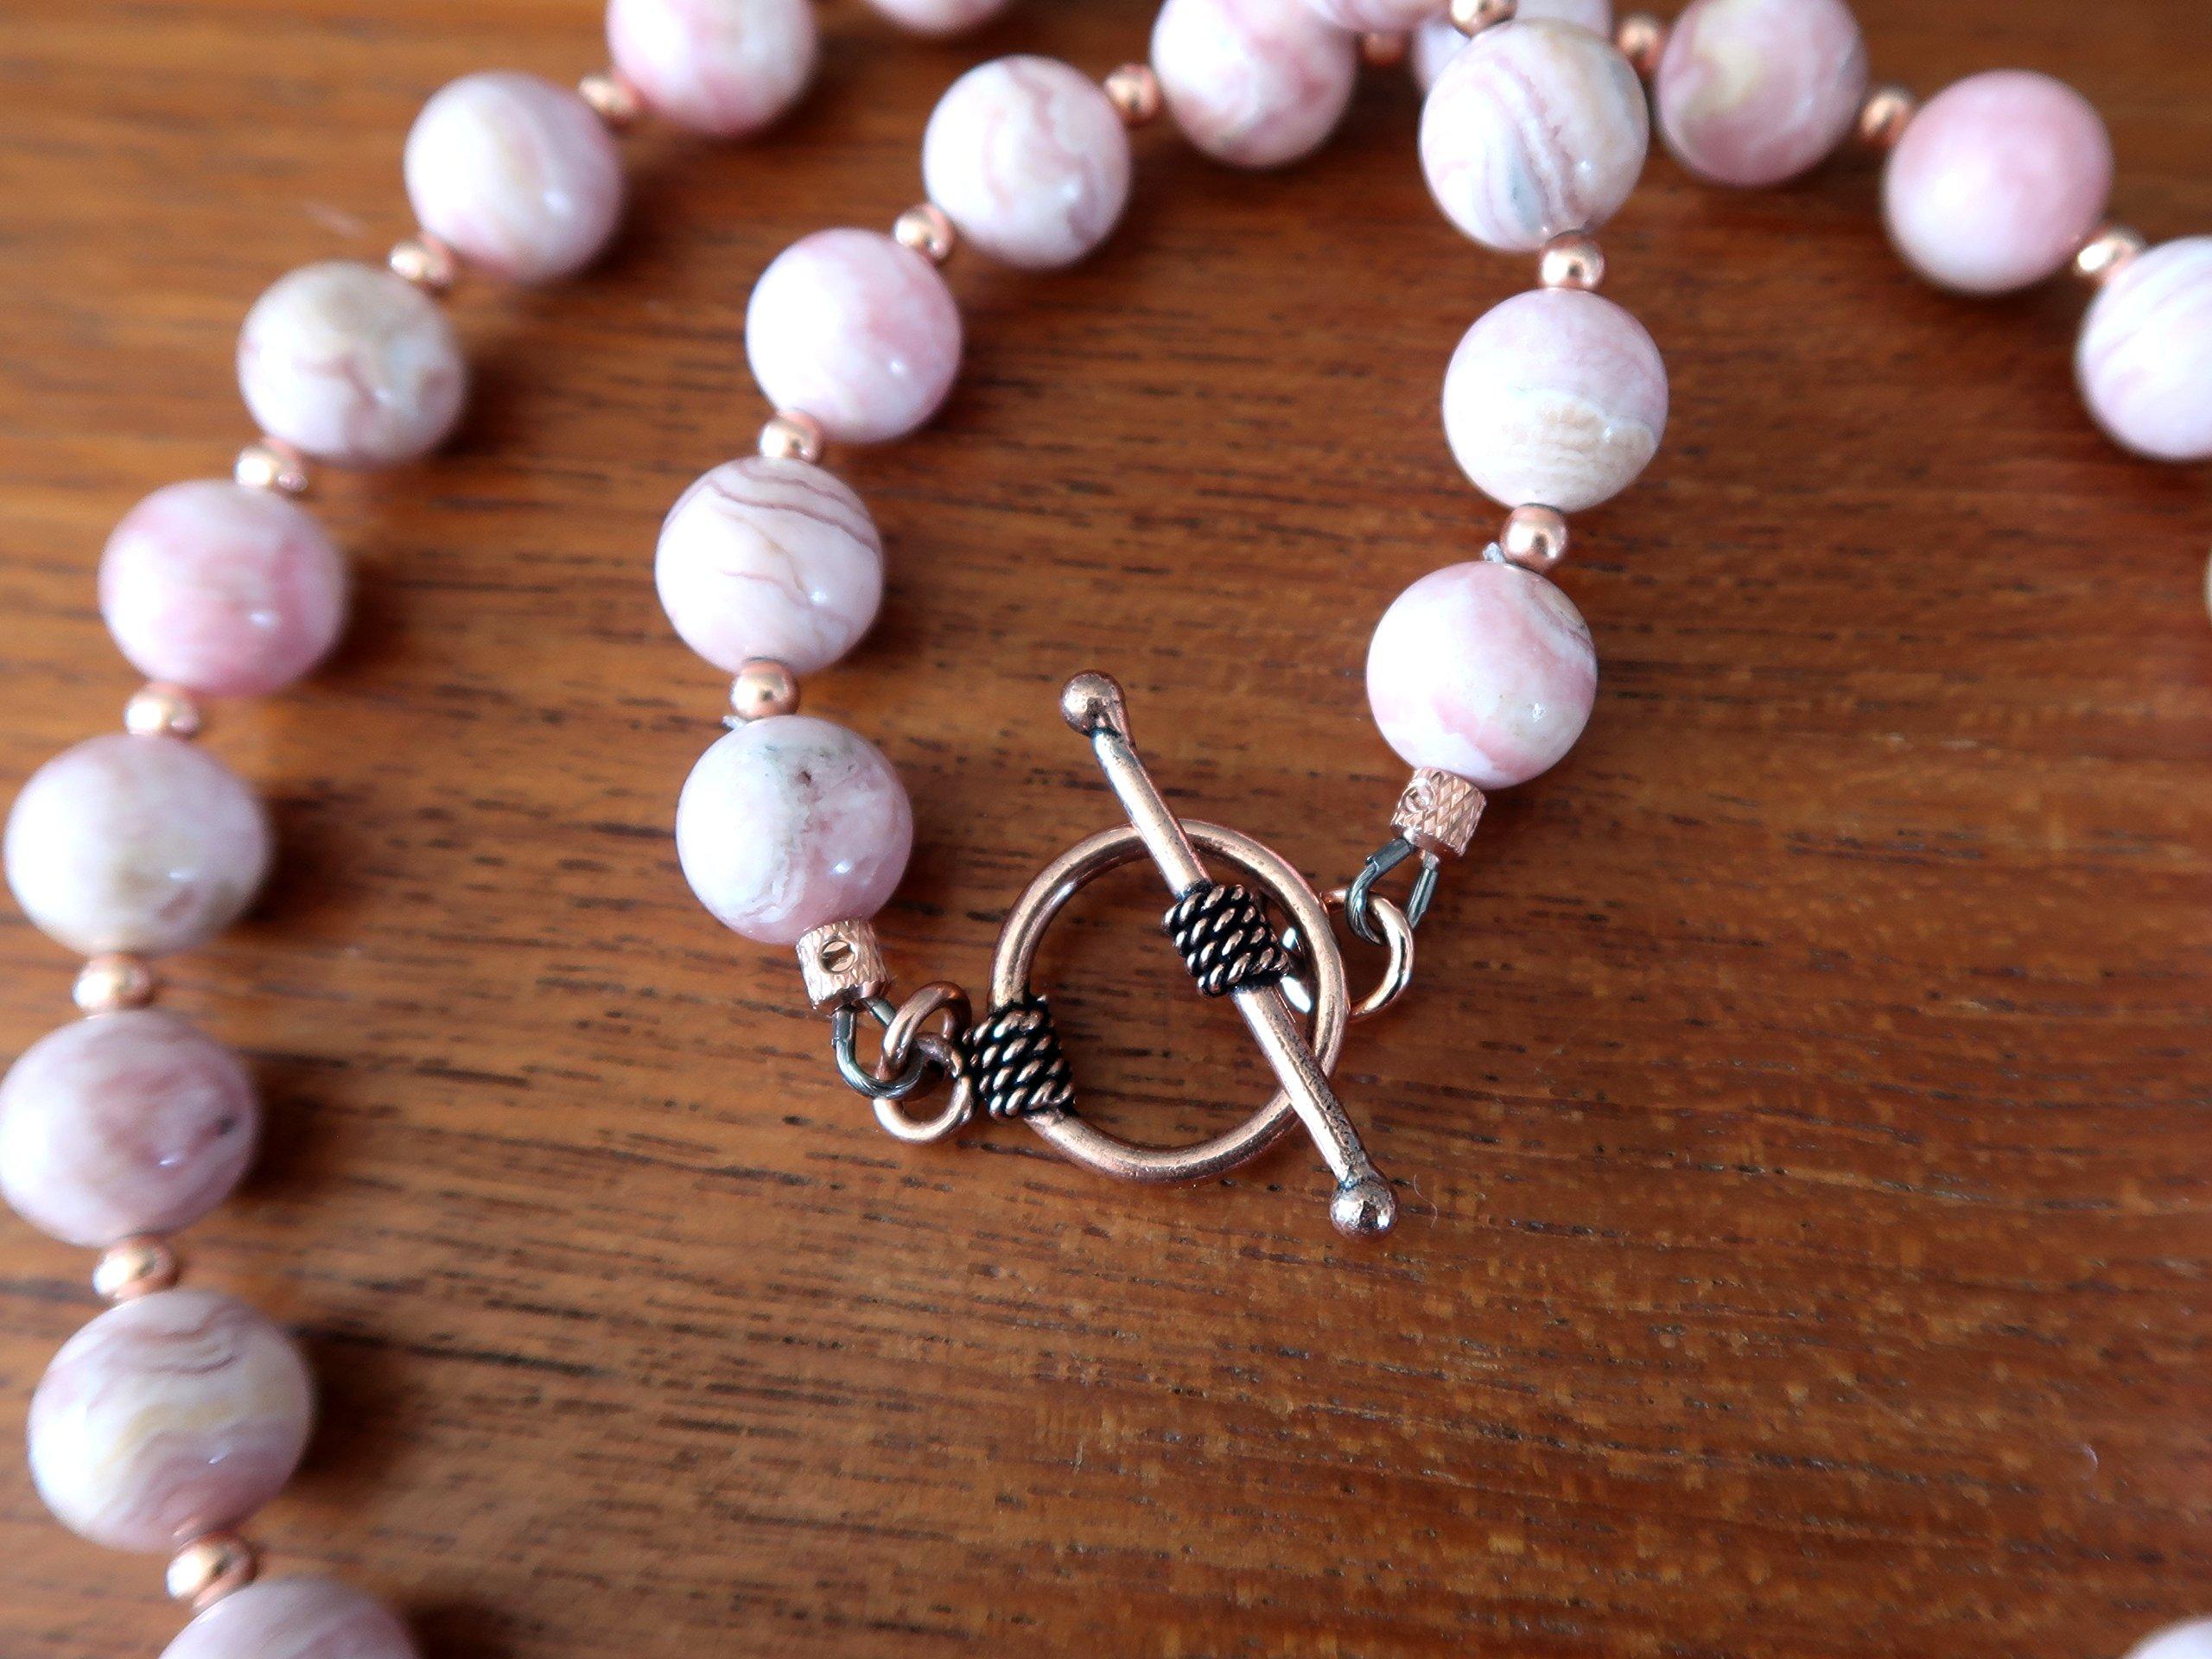 Satin Crystals Rhodochrosite Necklace Boutique Deluxe Pink Genuine Gemstone Round Beaded Copper B01 (17) by SatinCrystals (Image #6)